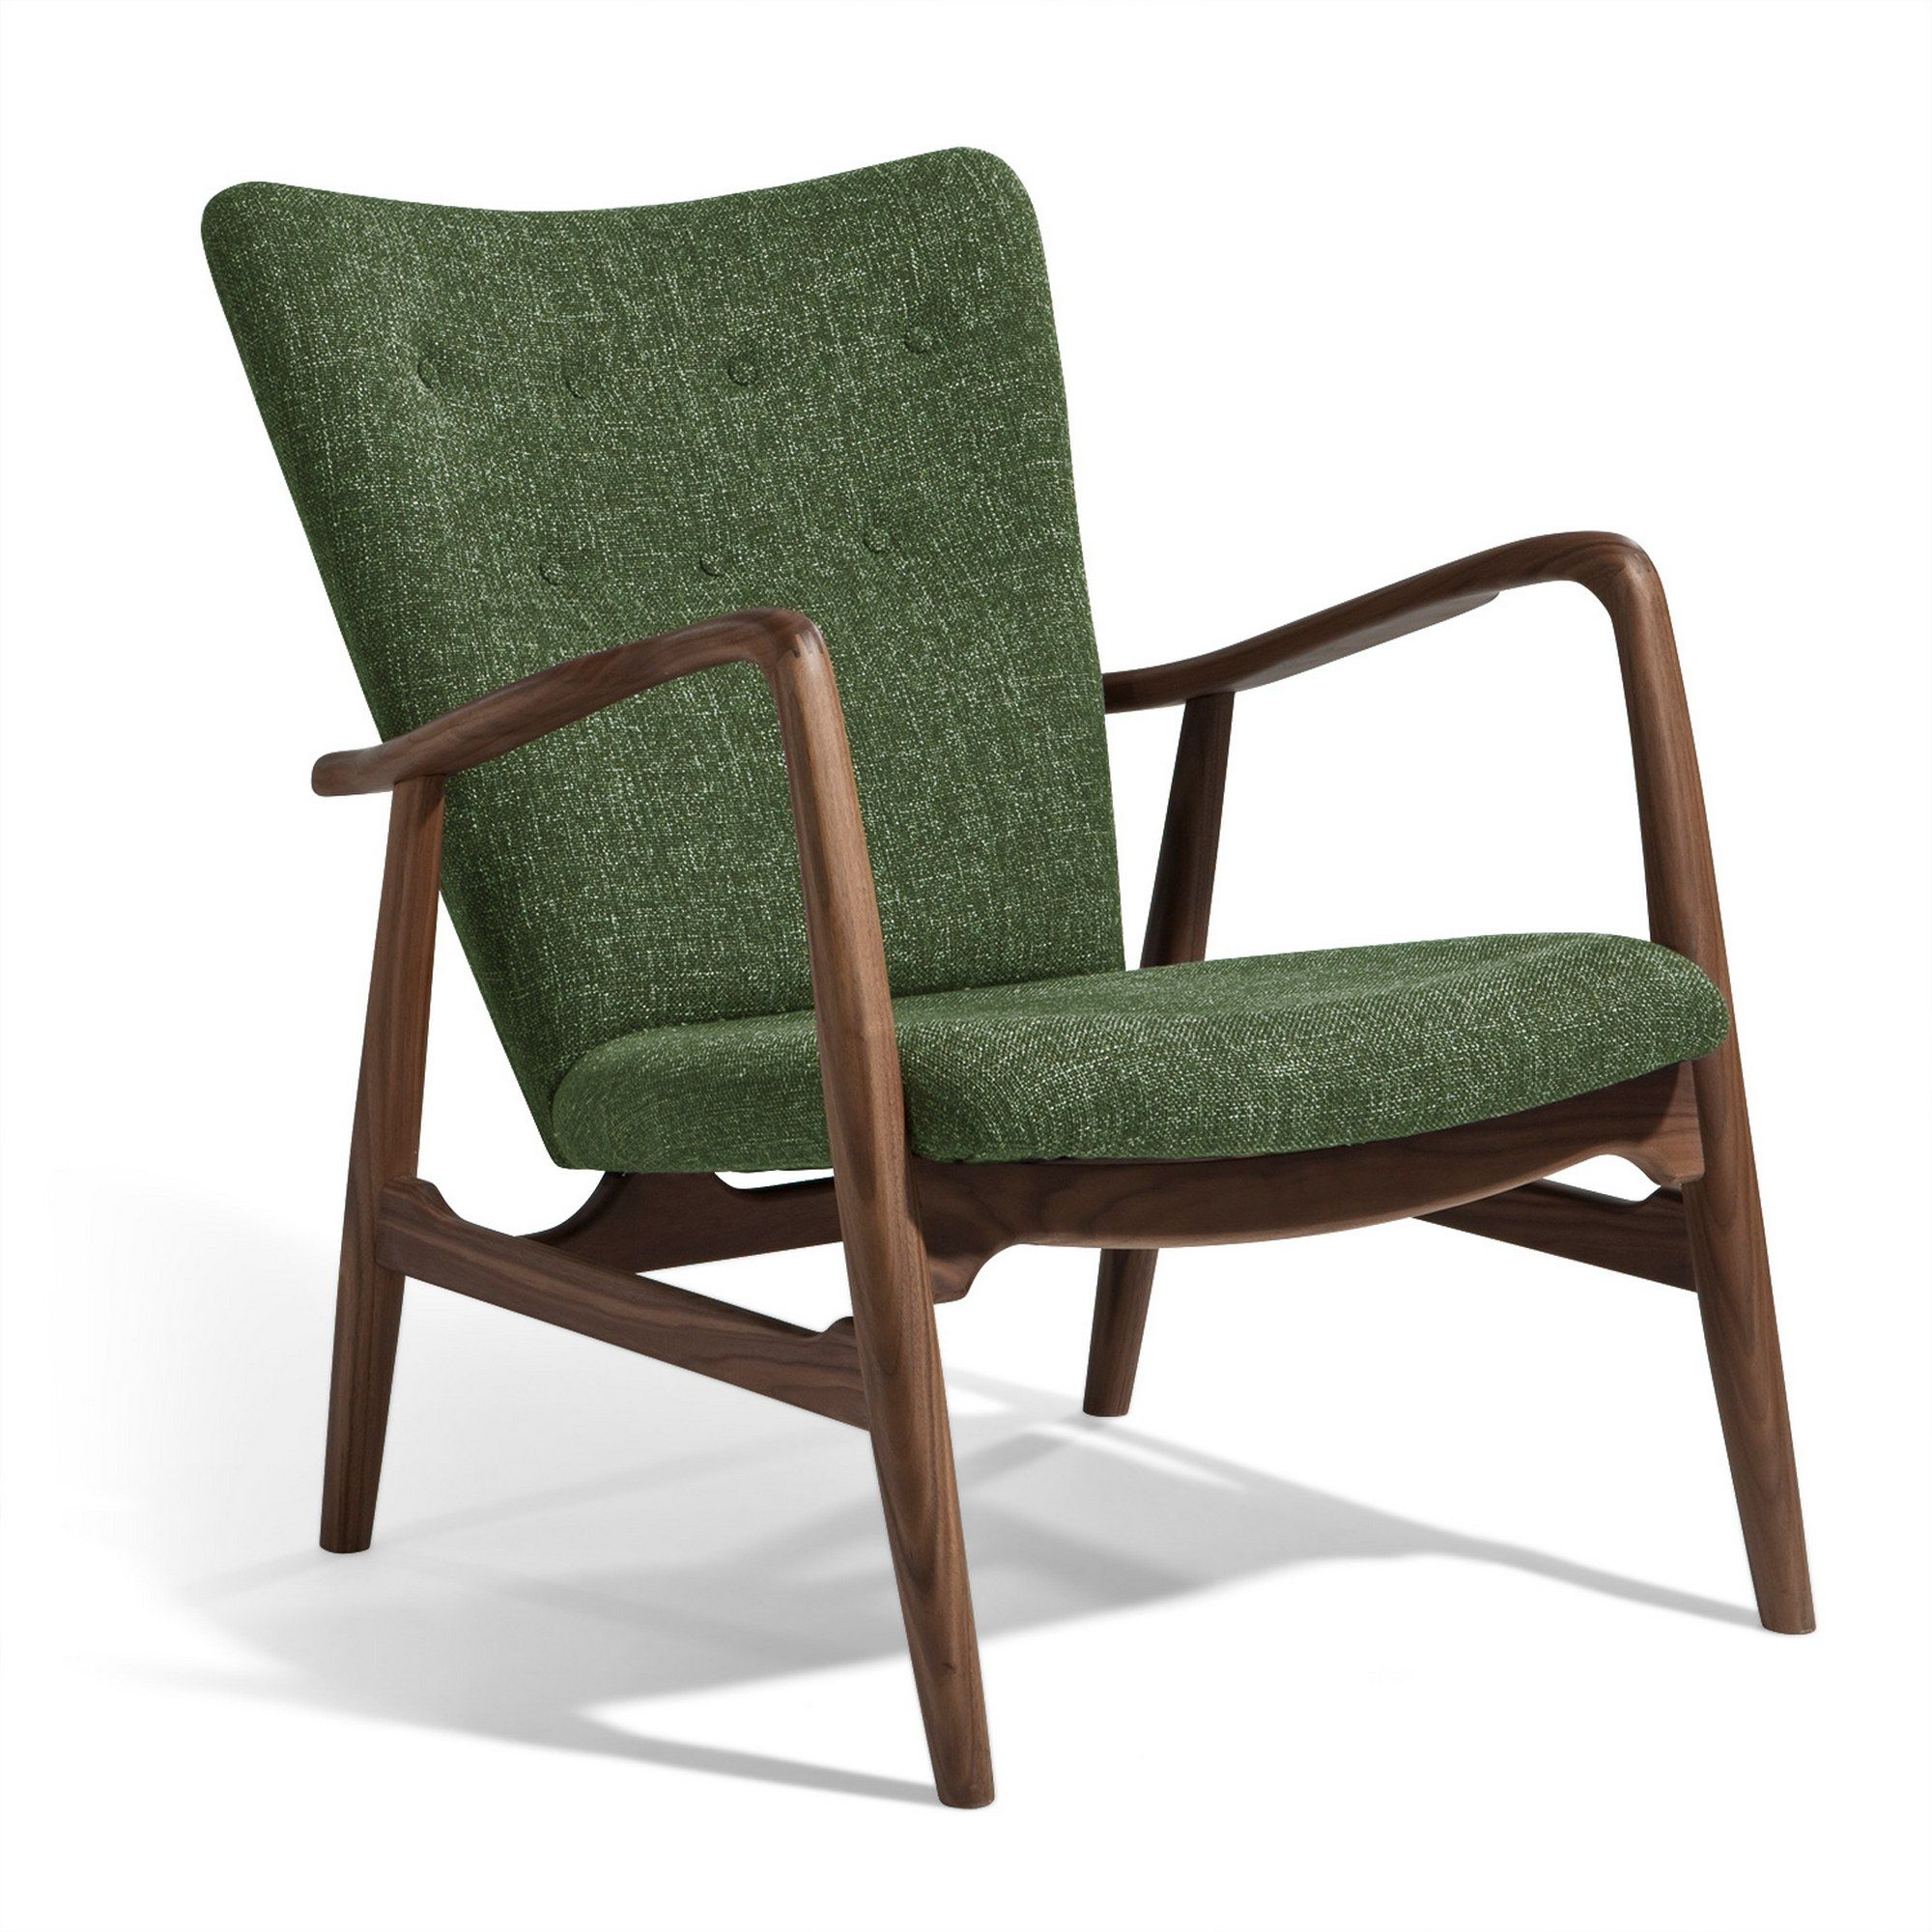 70 Best line Furniture Stores Websites to Buy Furniture line